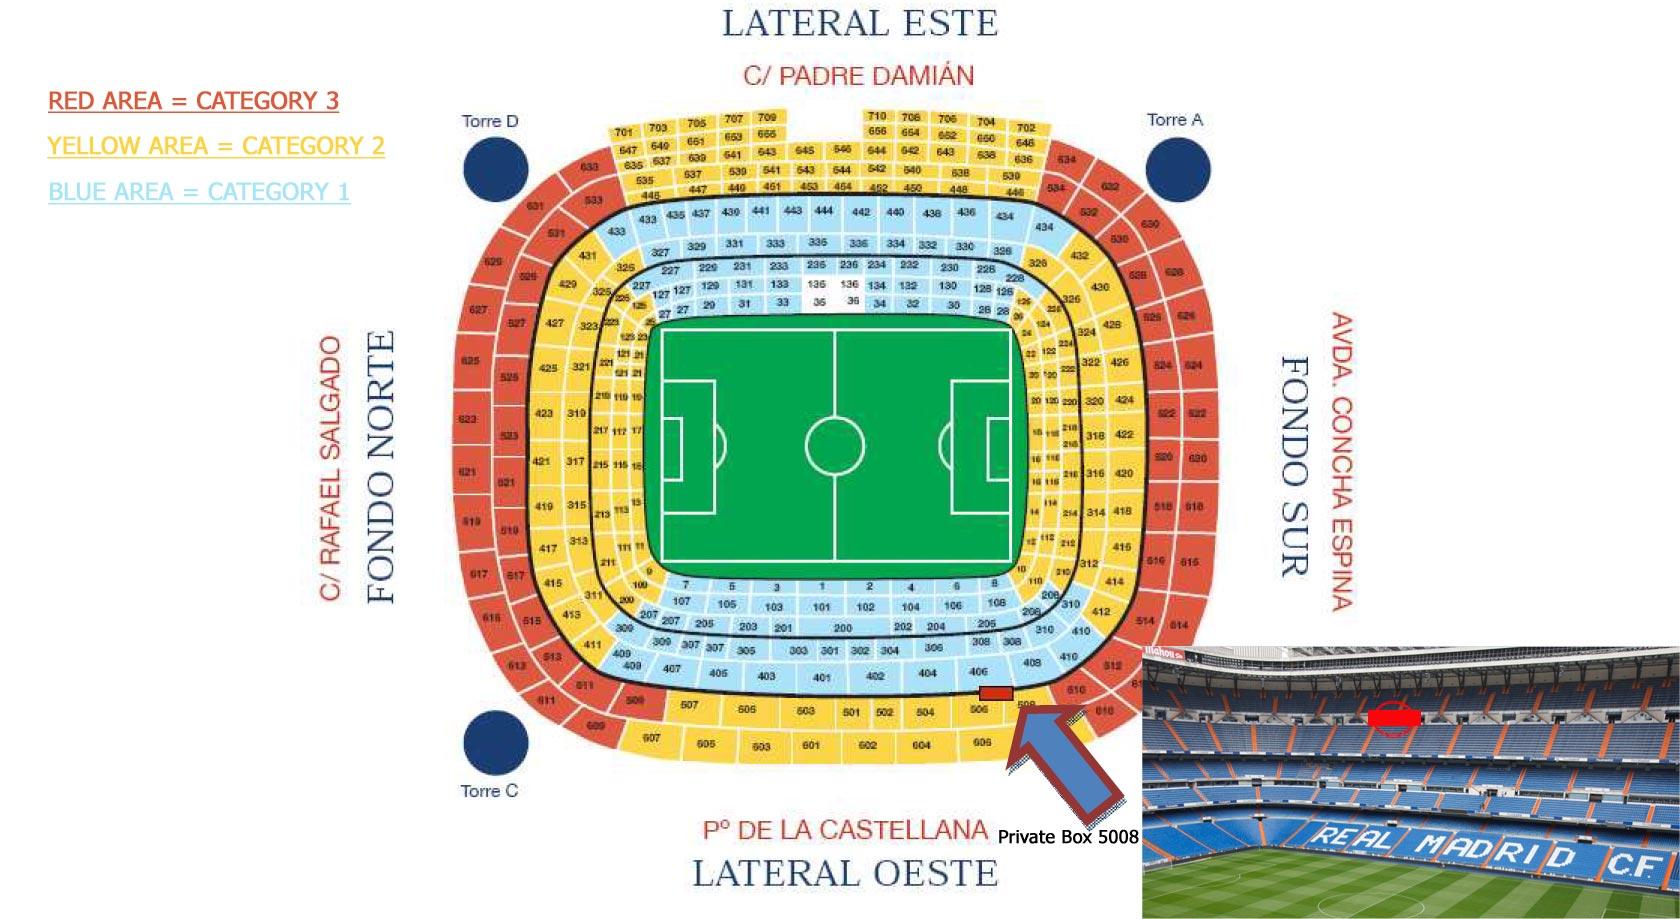 Plan de l'arène Santiago Bernabeu